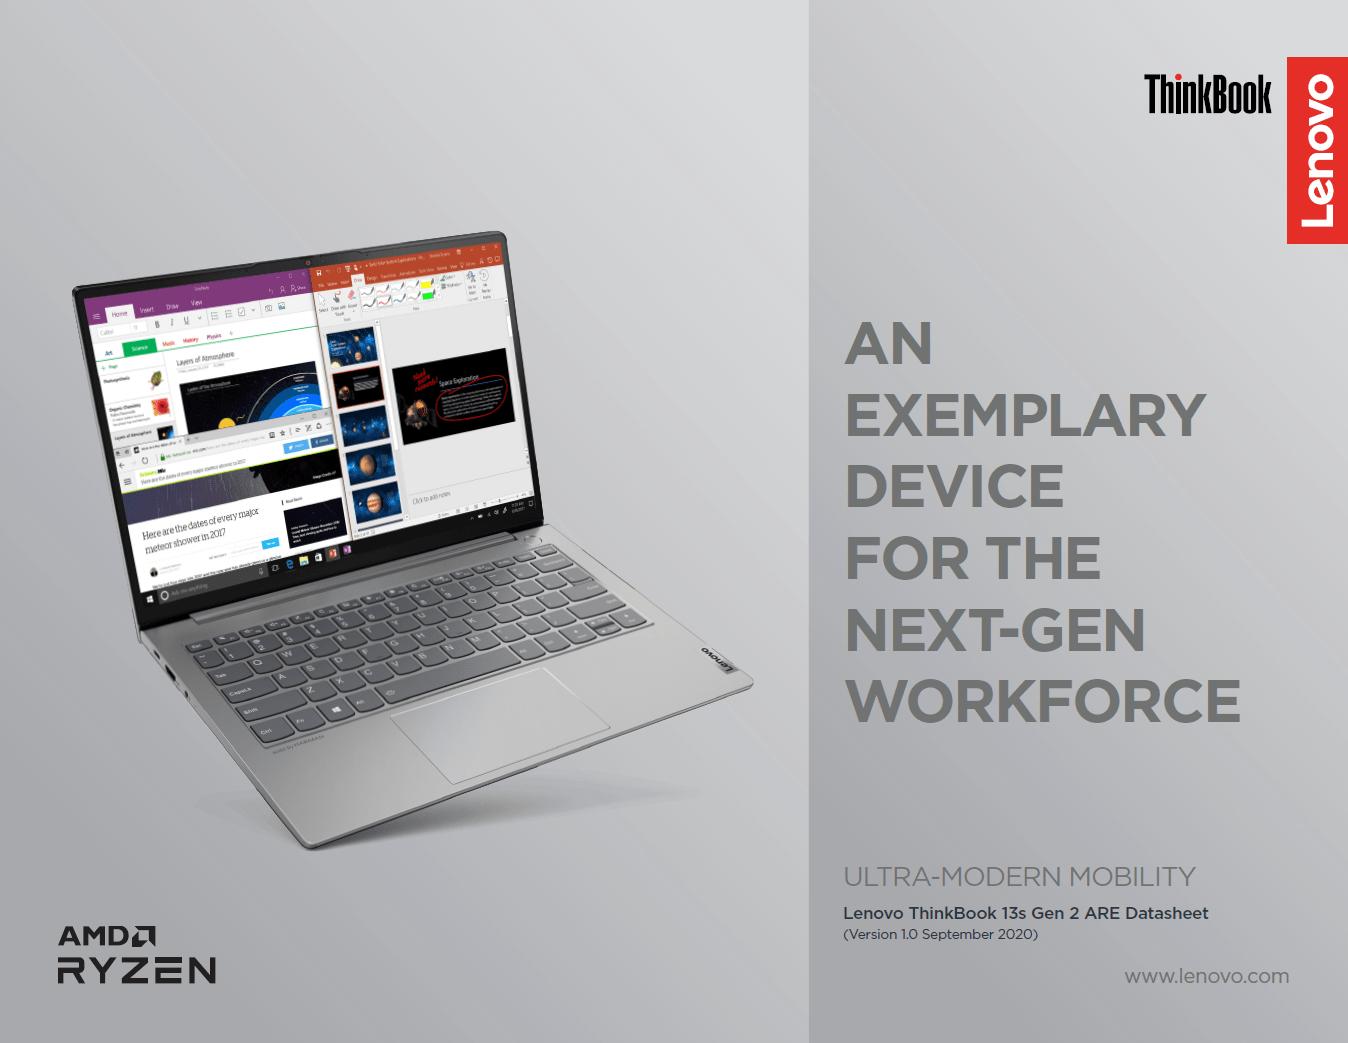 ThinkBook 13s Gen 2 ARE